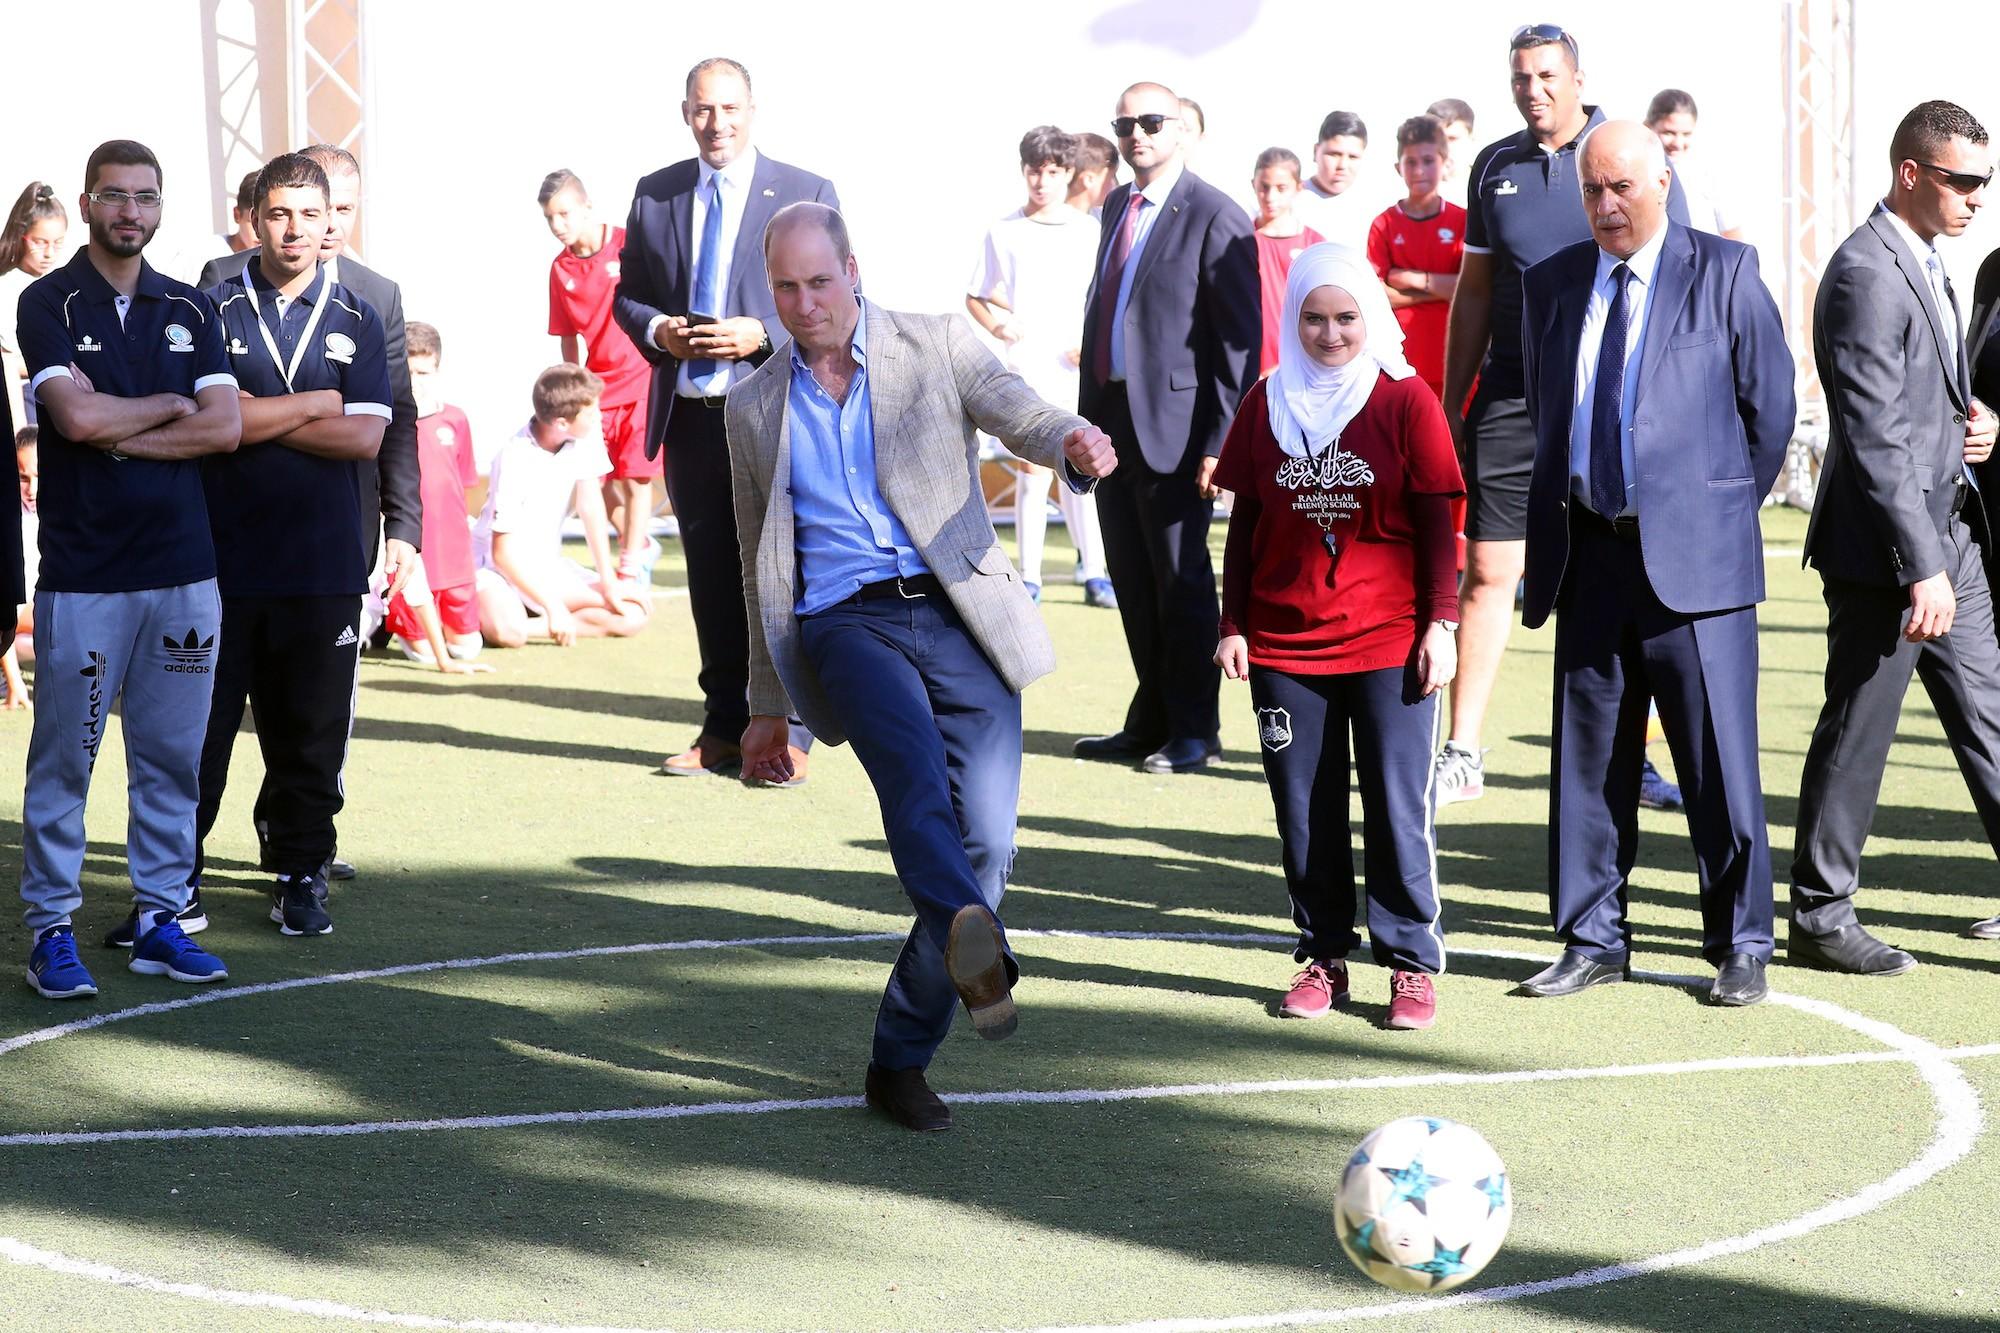 Prince William soccer